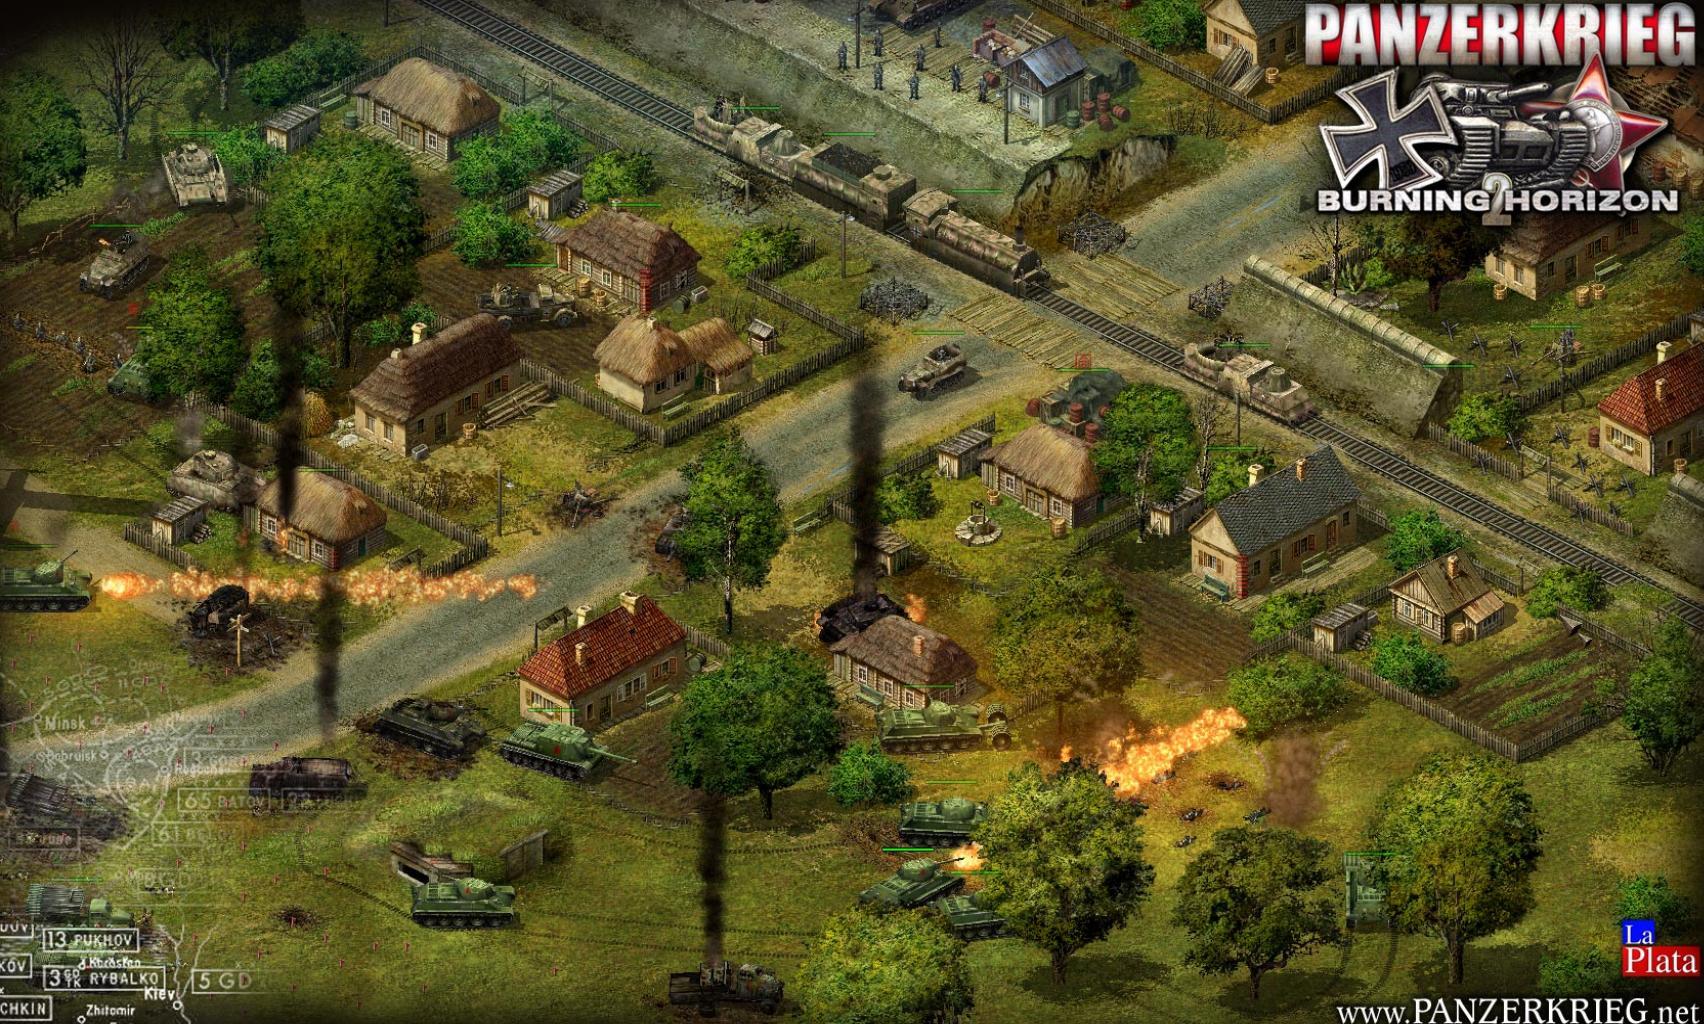 http://www.igroport.ru/games_img/67998_panzerkrieg_burning_horizon_2-10.jpg